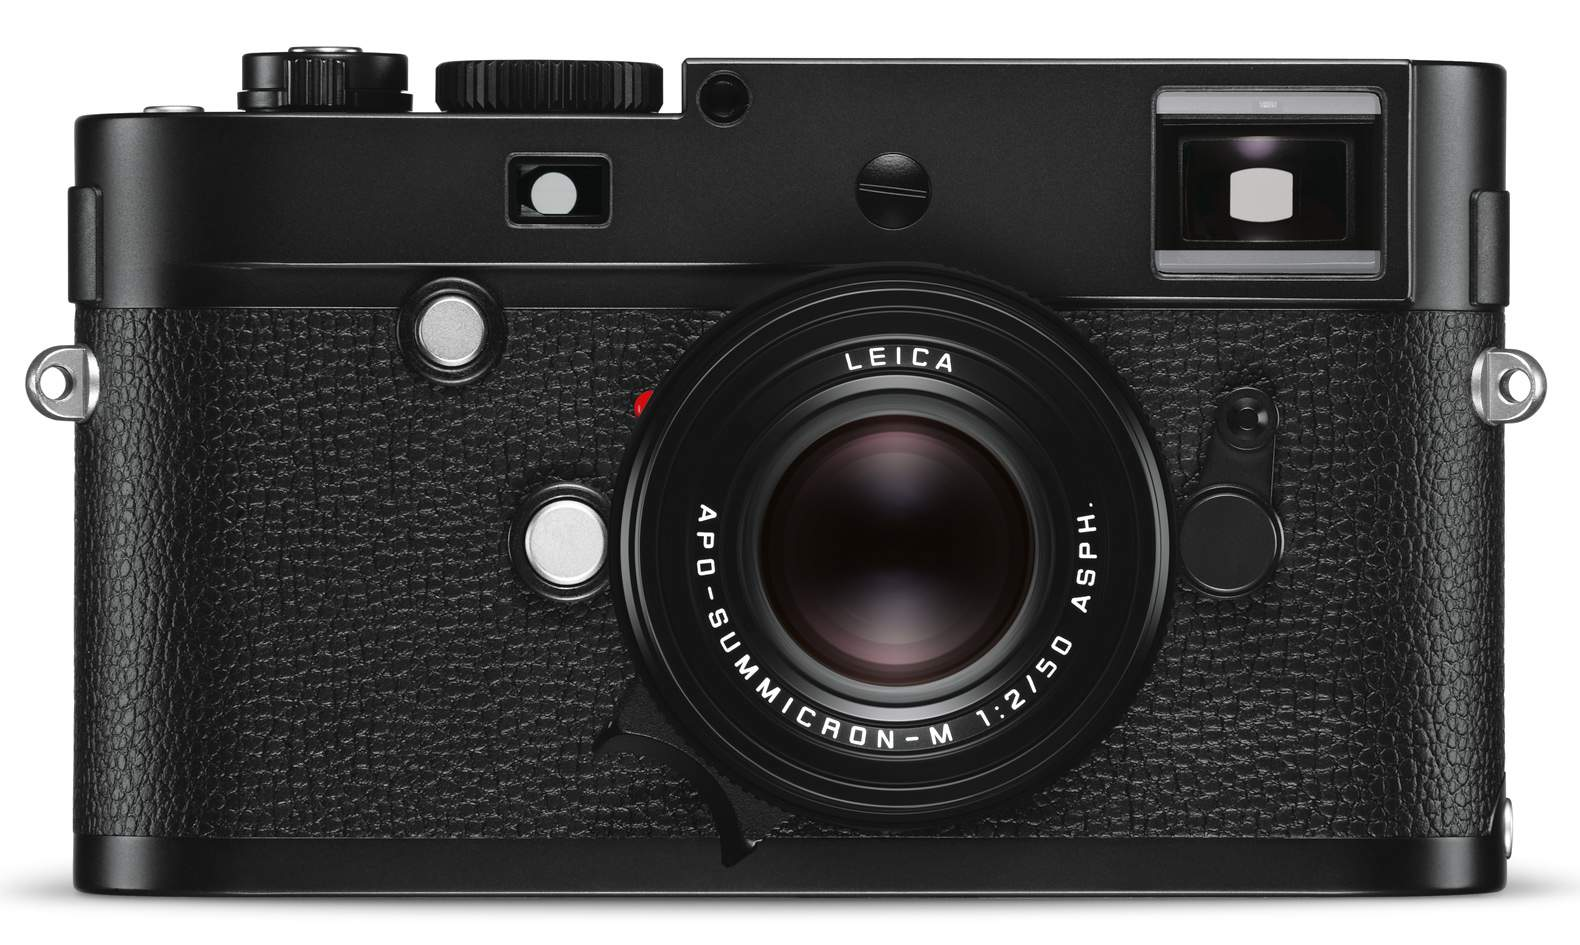 Leica M-Monochrom (Type 246): Kamera Hitam Putih dengan Sensor 24MP